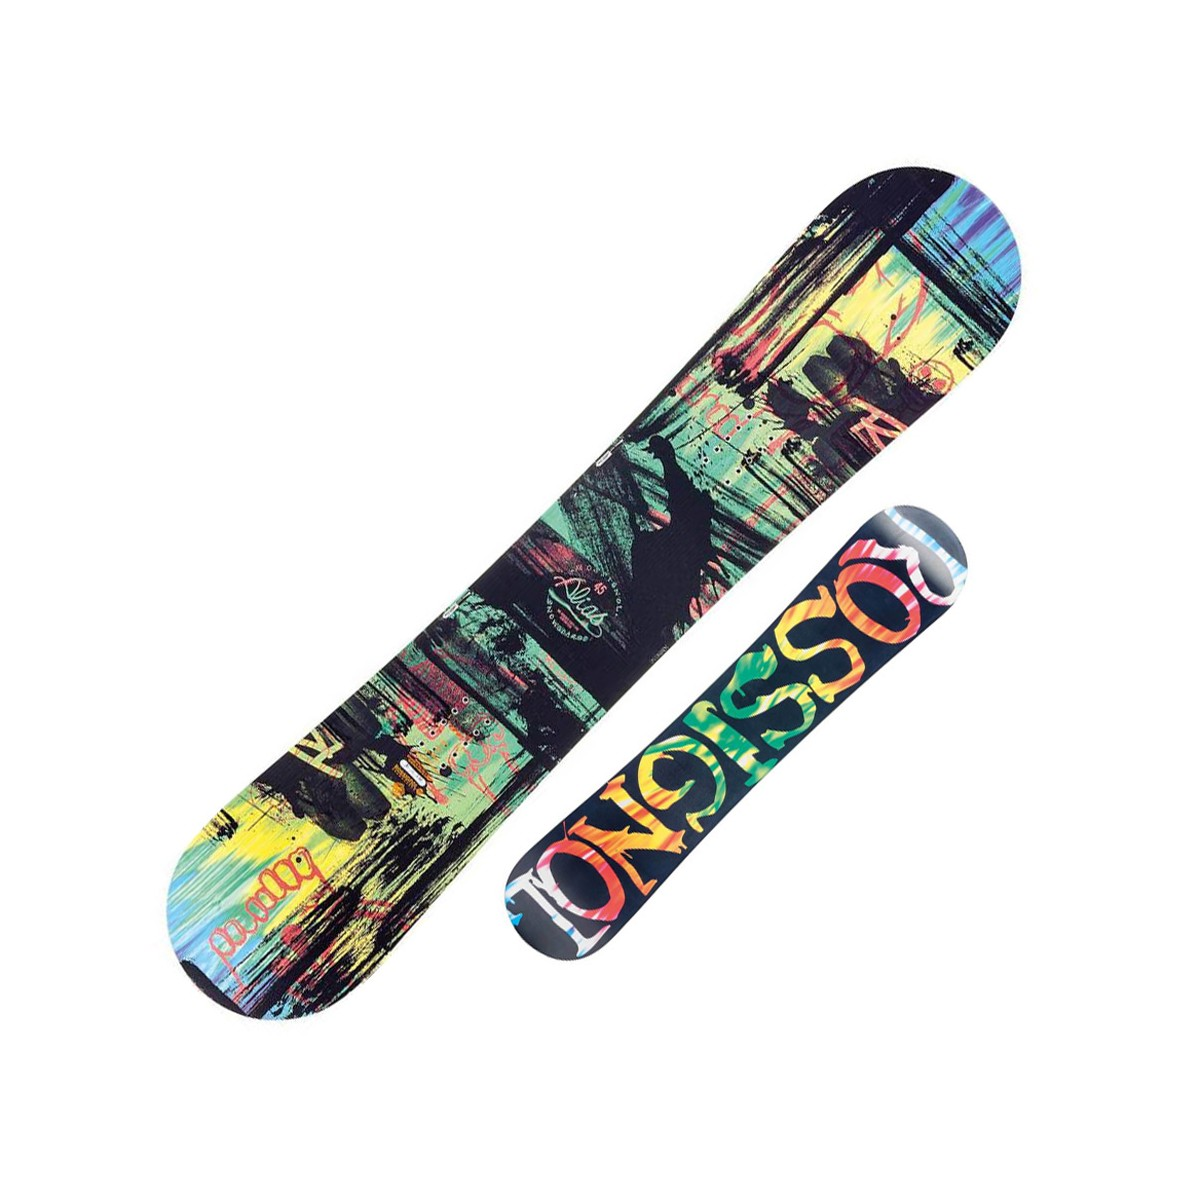 Snowboard Rossignol Alias Amptek (Colore: nero-verde, Taglia: 145)